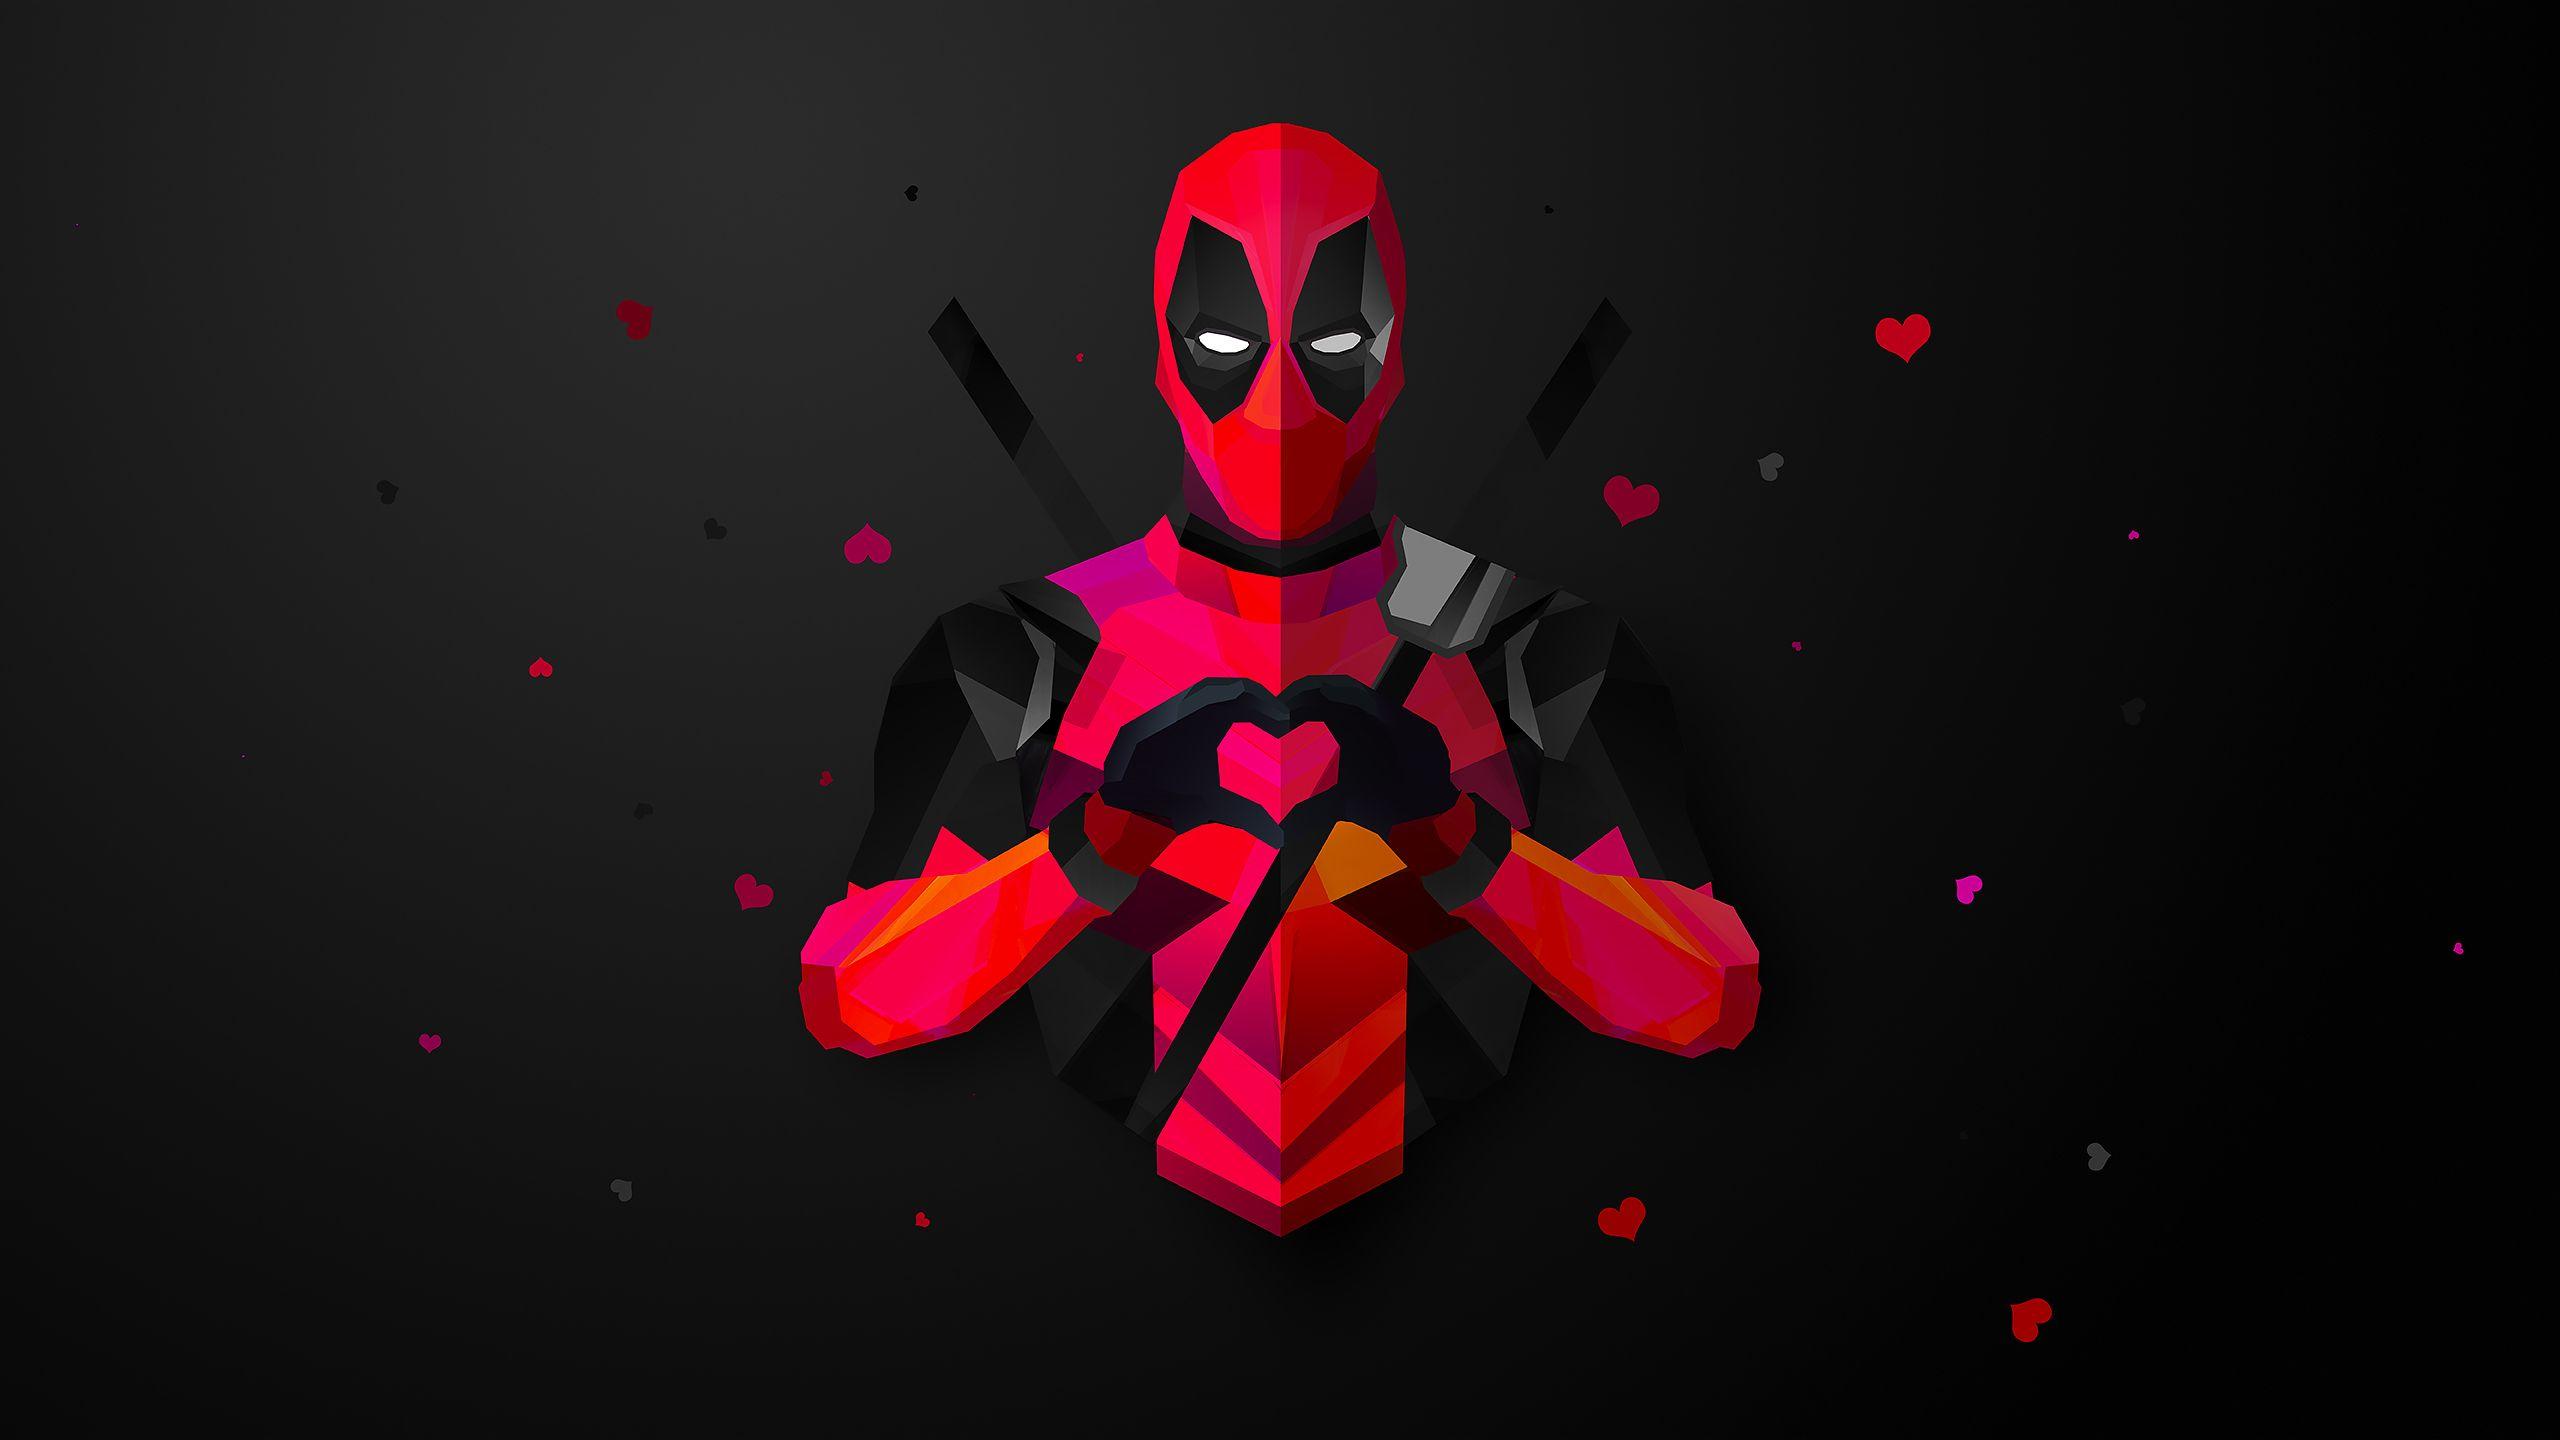 Deadpool Low Poly 2560x1440 R Wallpapers Deadpool Wallpaper Superhero Wallpaper Deadpool Logo Wallpaper